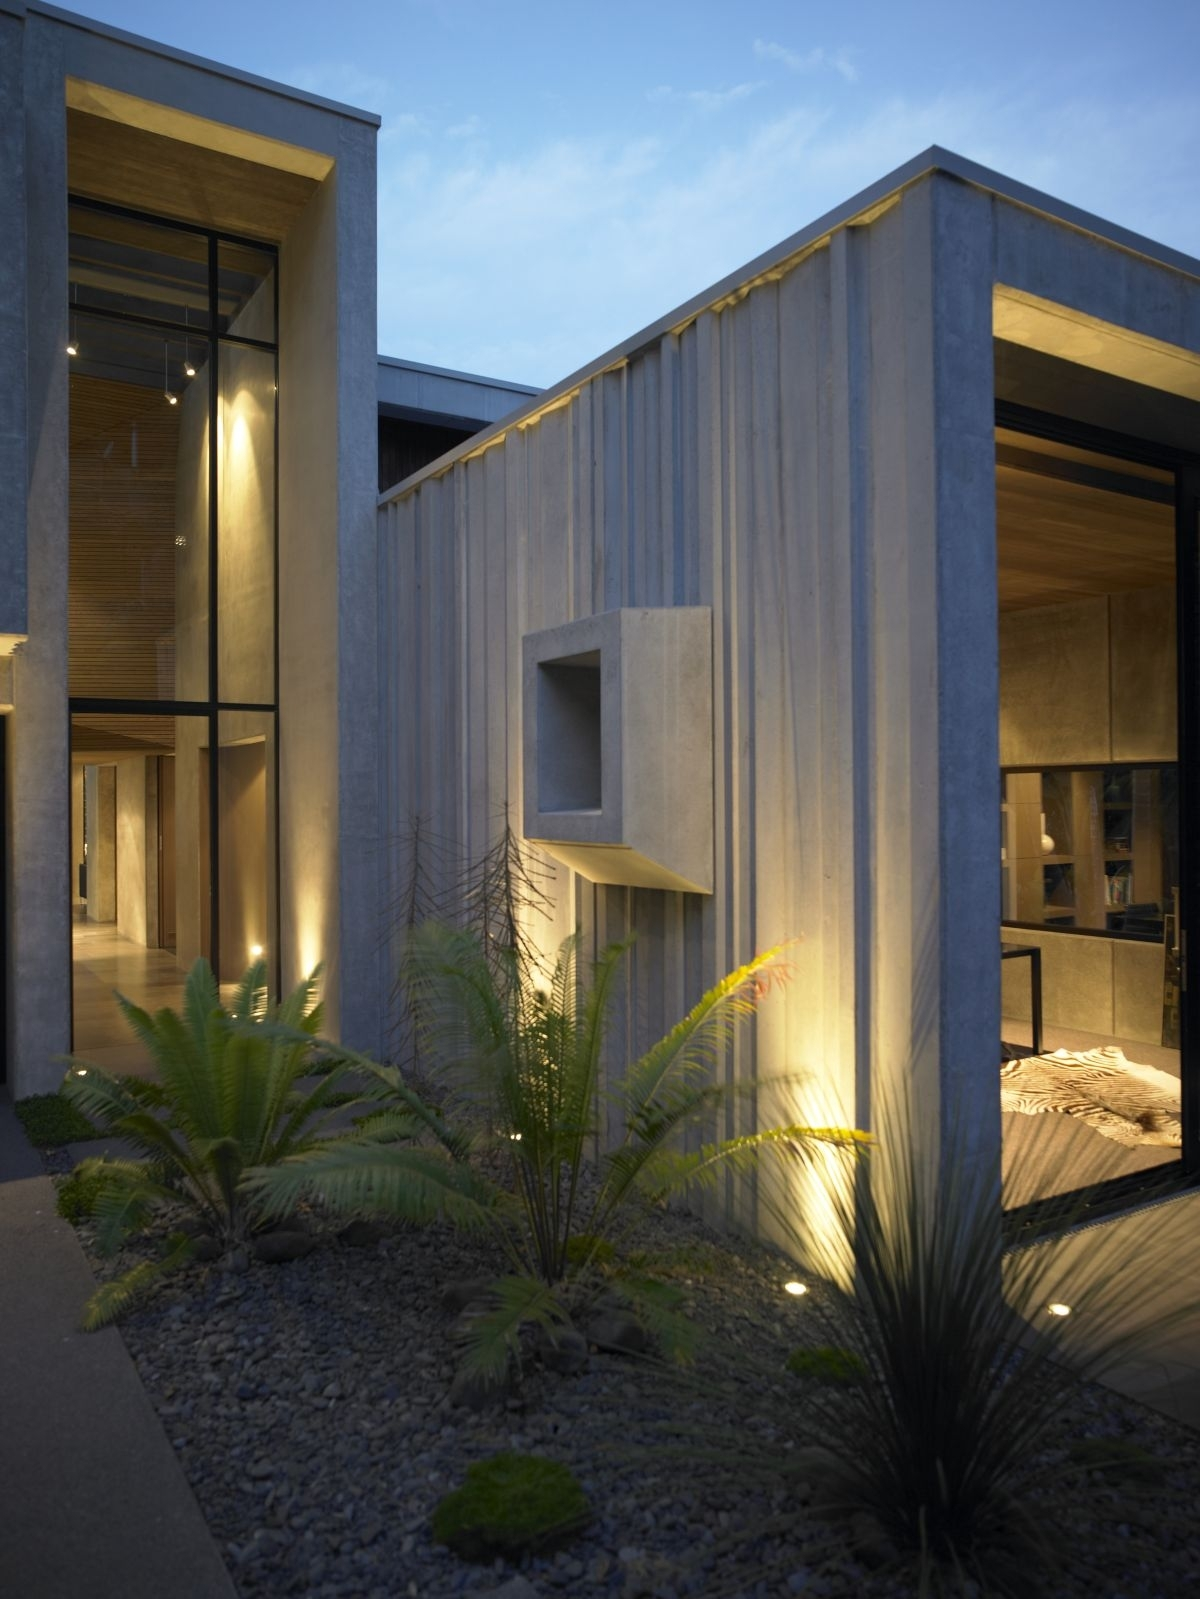 Outdoor And Patio: Modern Exterior Lighting Fixtures On Stones Pertaining To Modern Patio Outdoor Light Fixtures (#12 of 15)